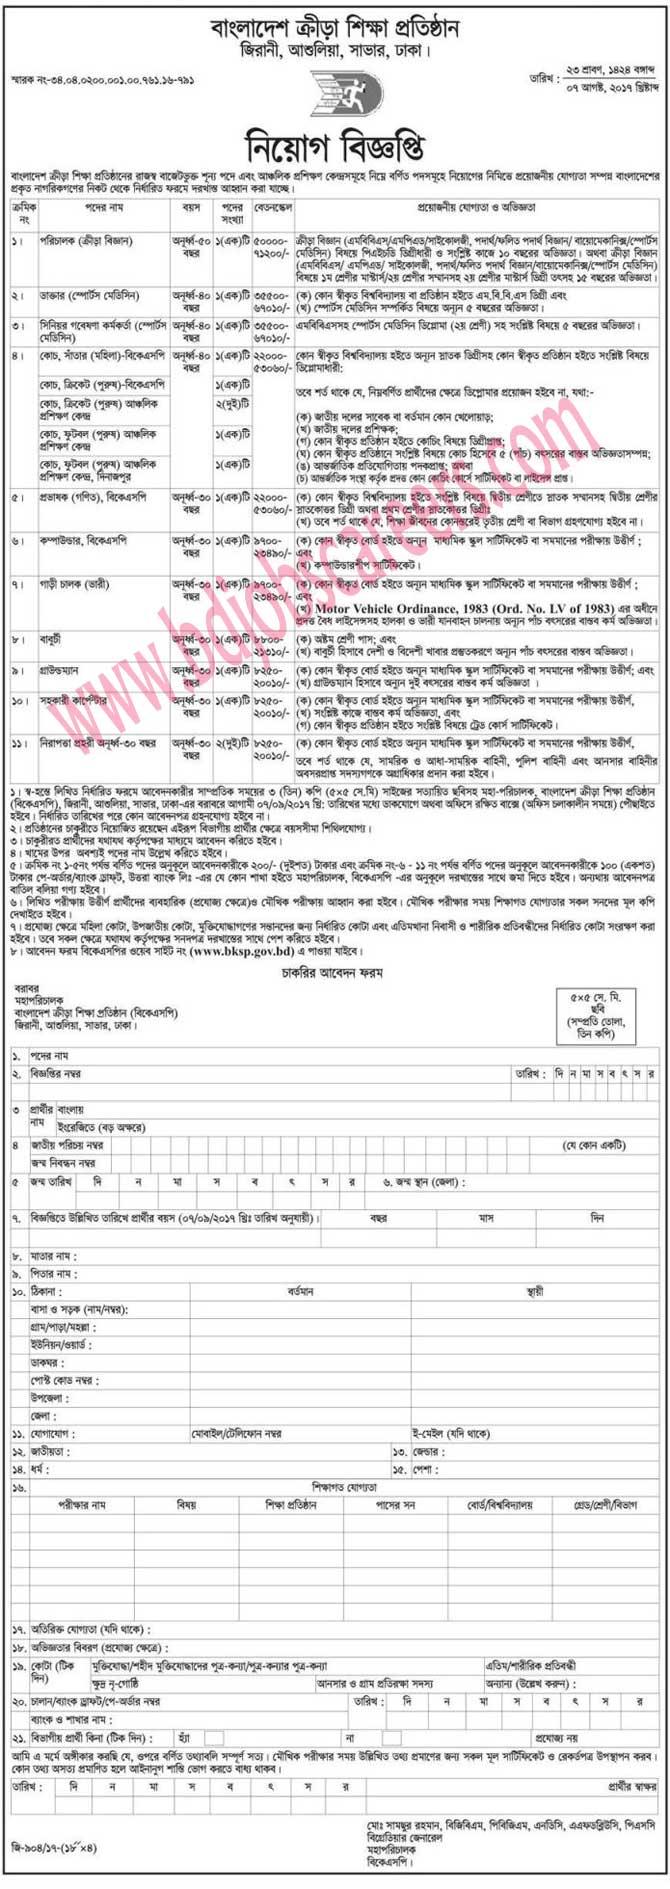 Bangladesh Krira Shikkha Protishtan (BKSP) Job Circular 2017